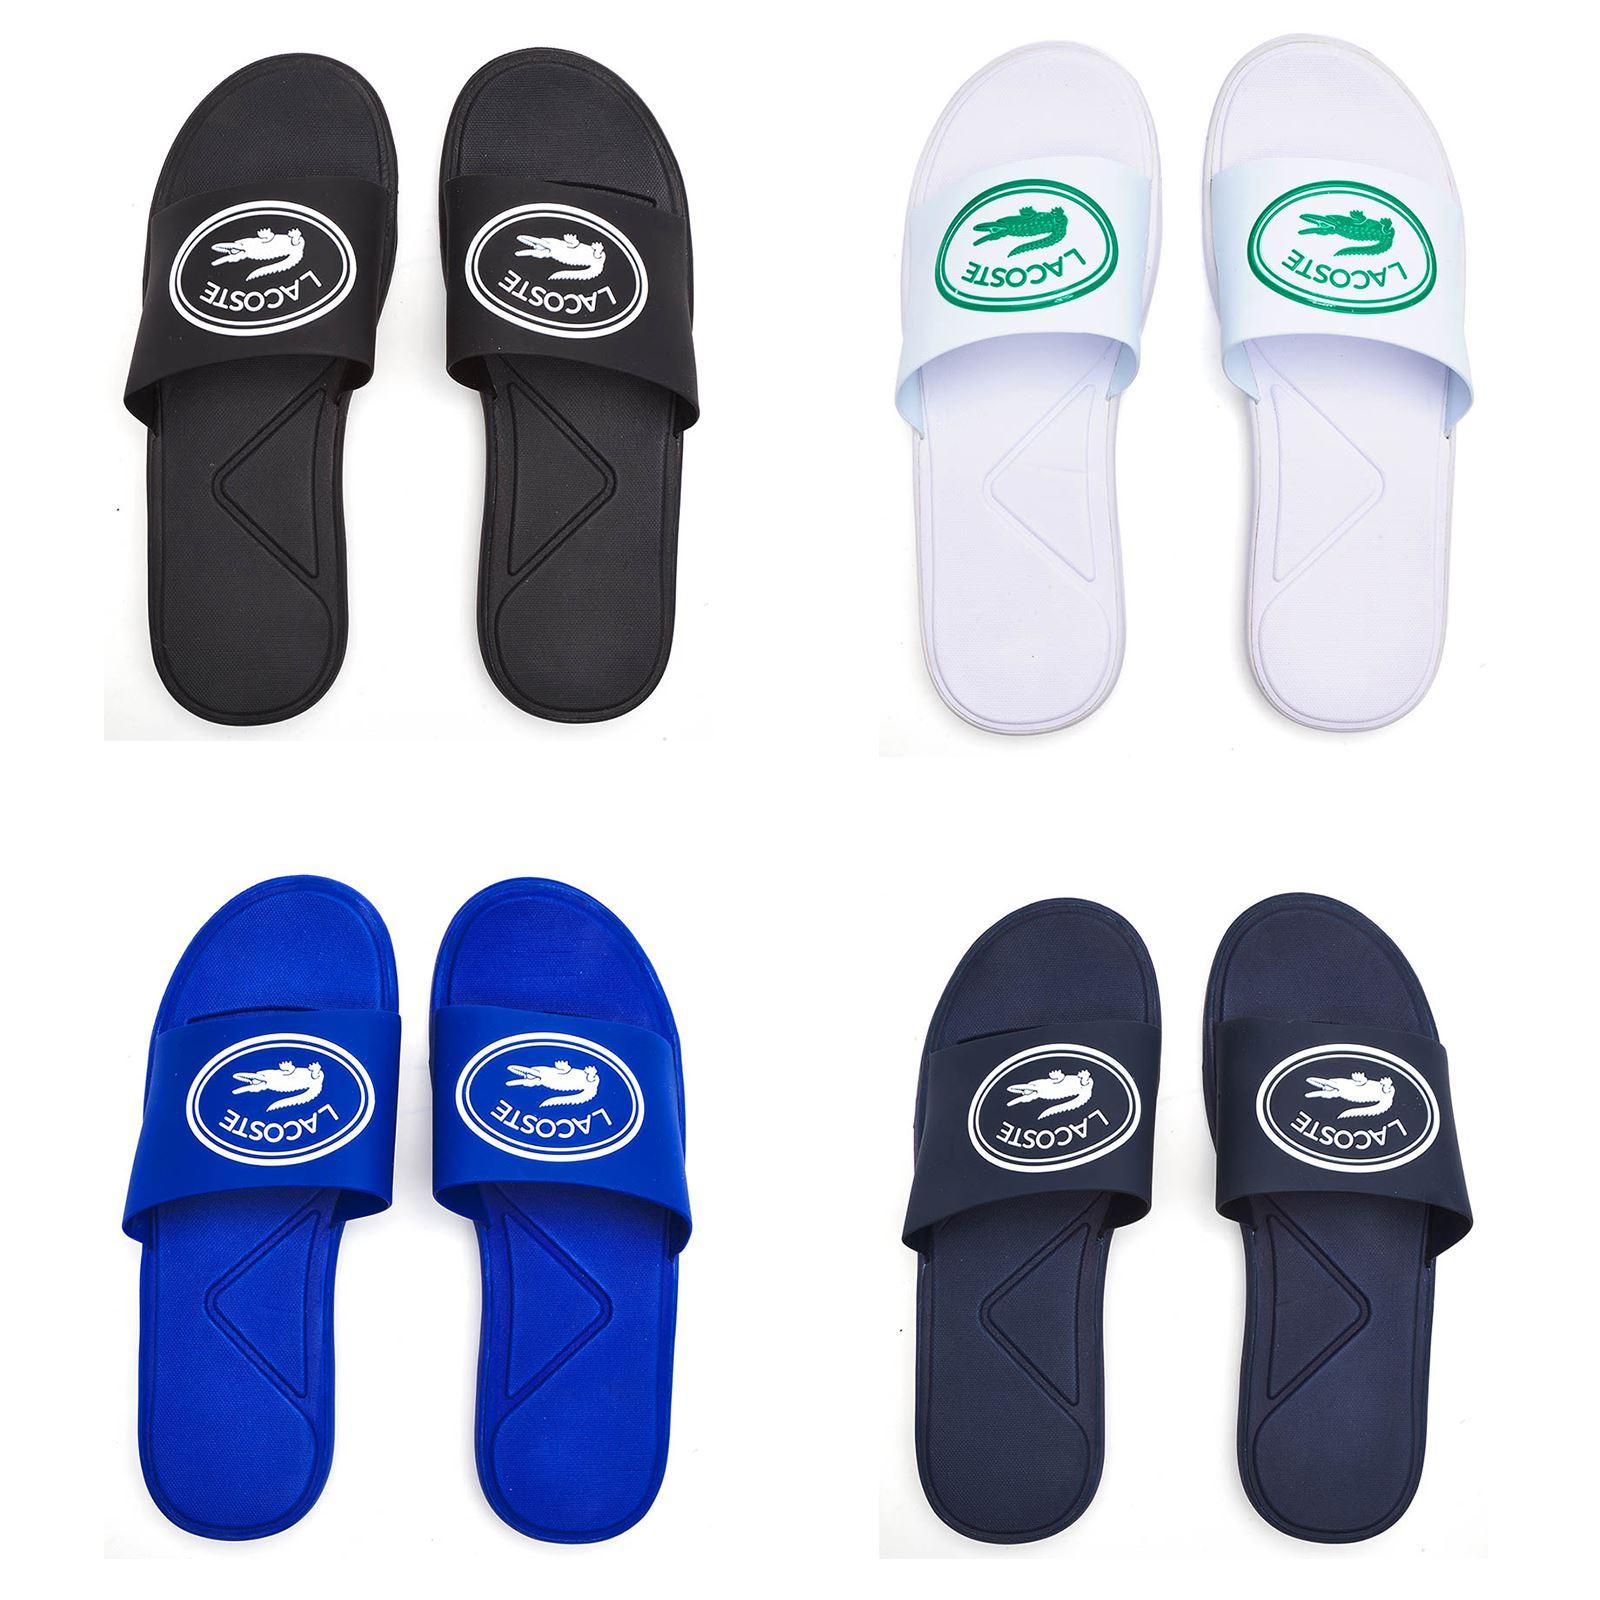 8d83d3899cfa94 Details about Lacoste L.30 119 3 CMA Slide Pool Beach Slip On Sandals in  Black